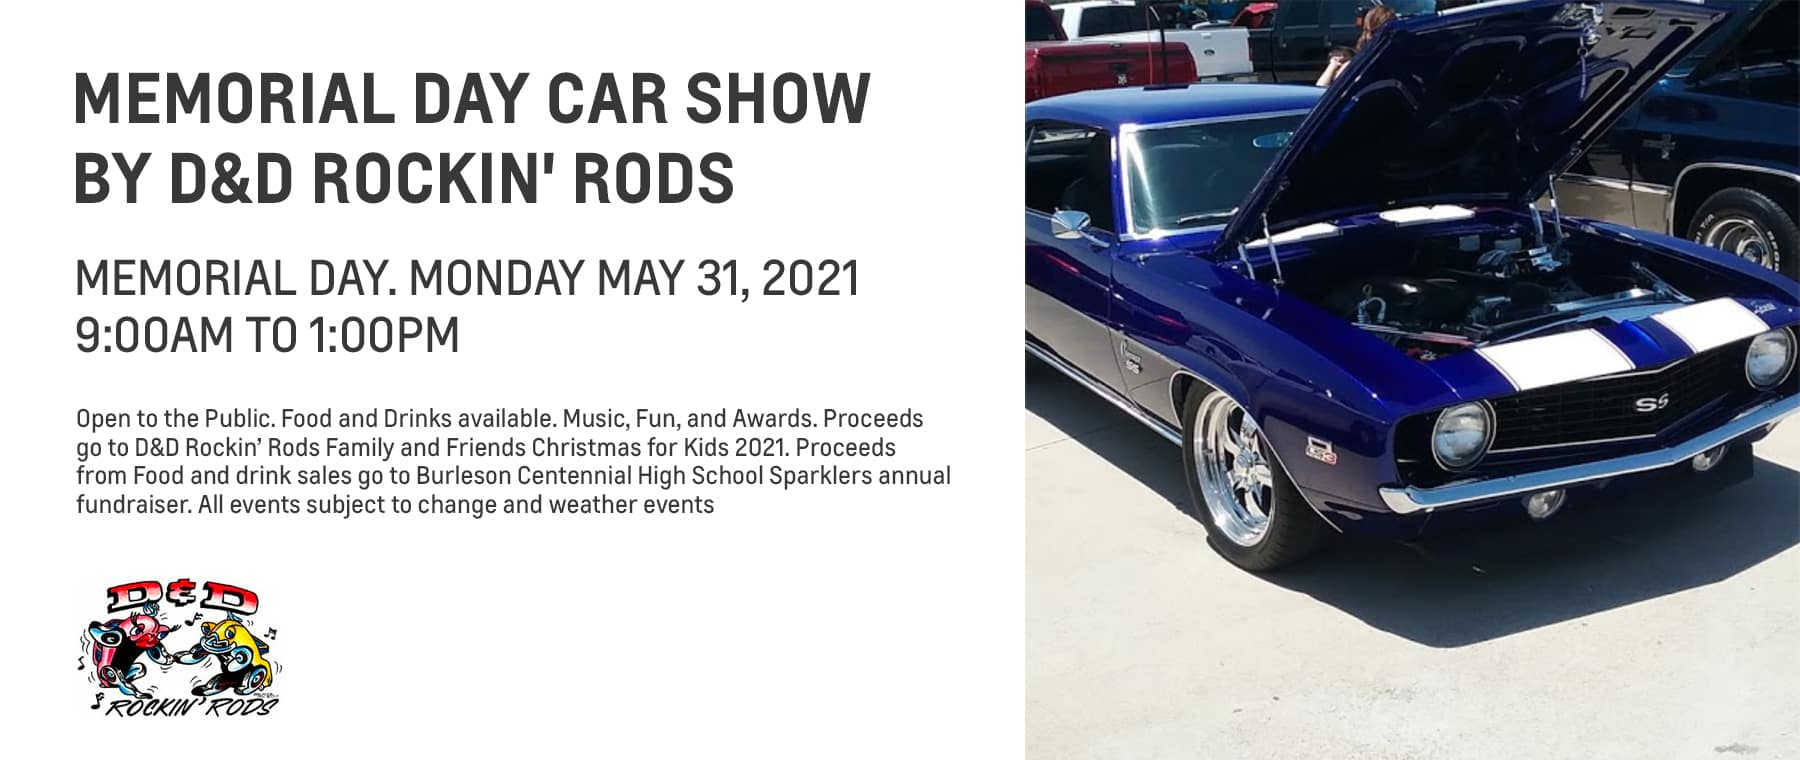 Memorial Day Car Show